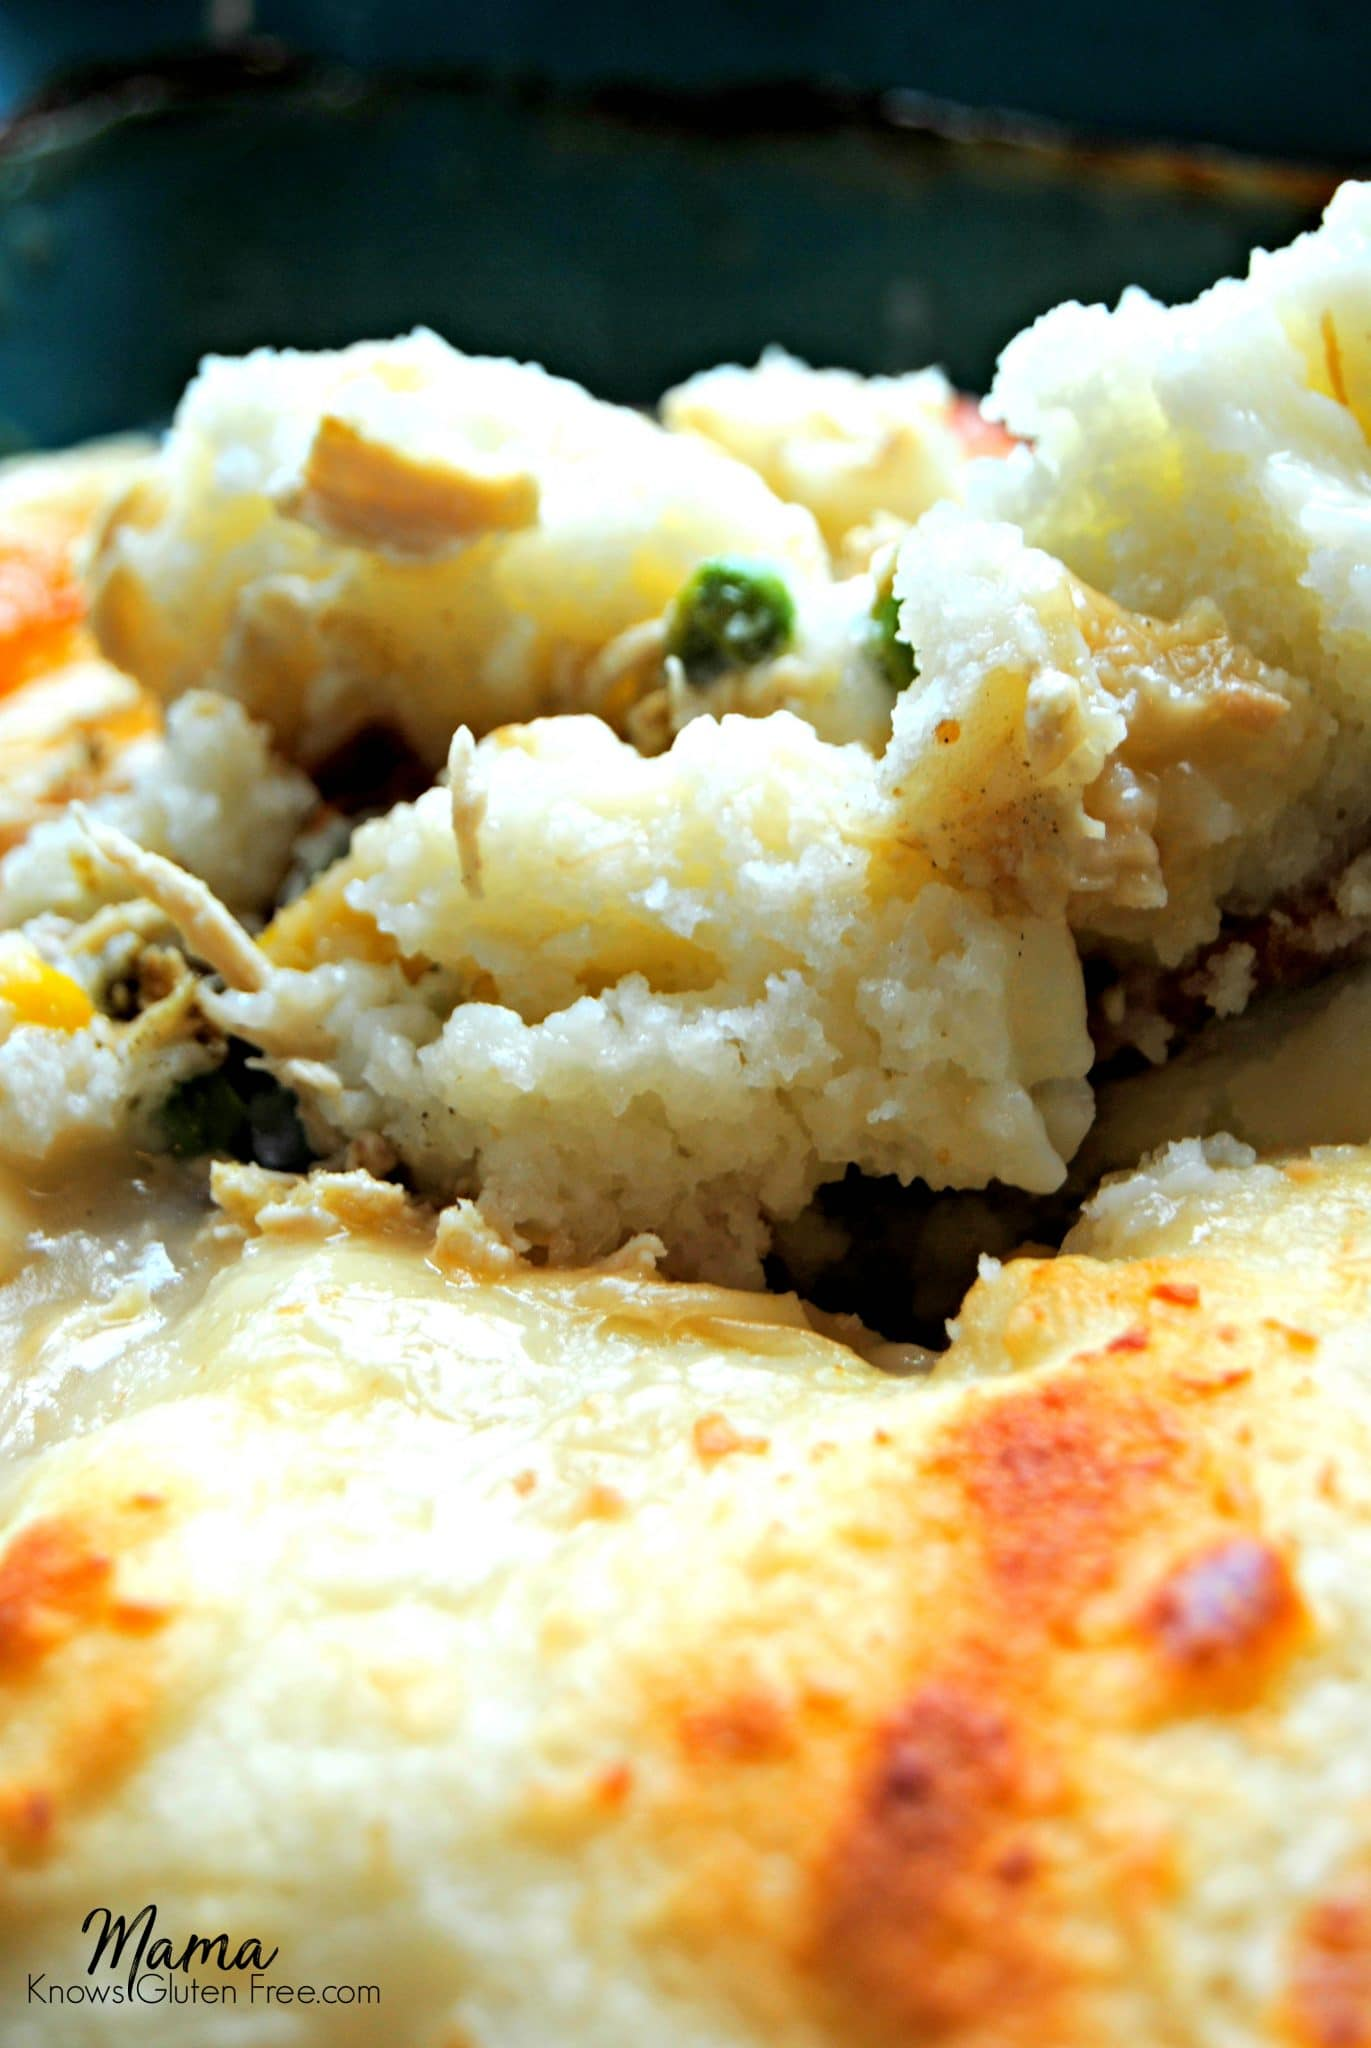 close up of a pan of gluten-free chicken and dumplings casserole